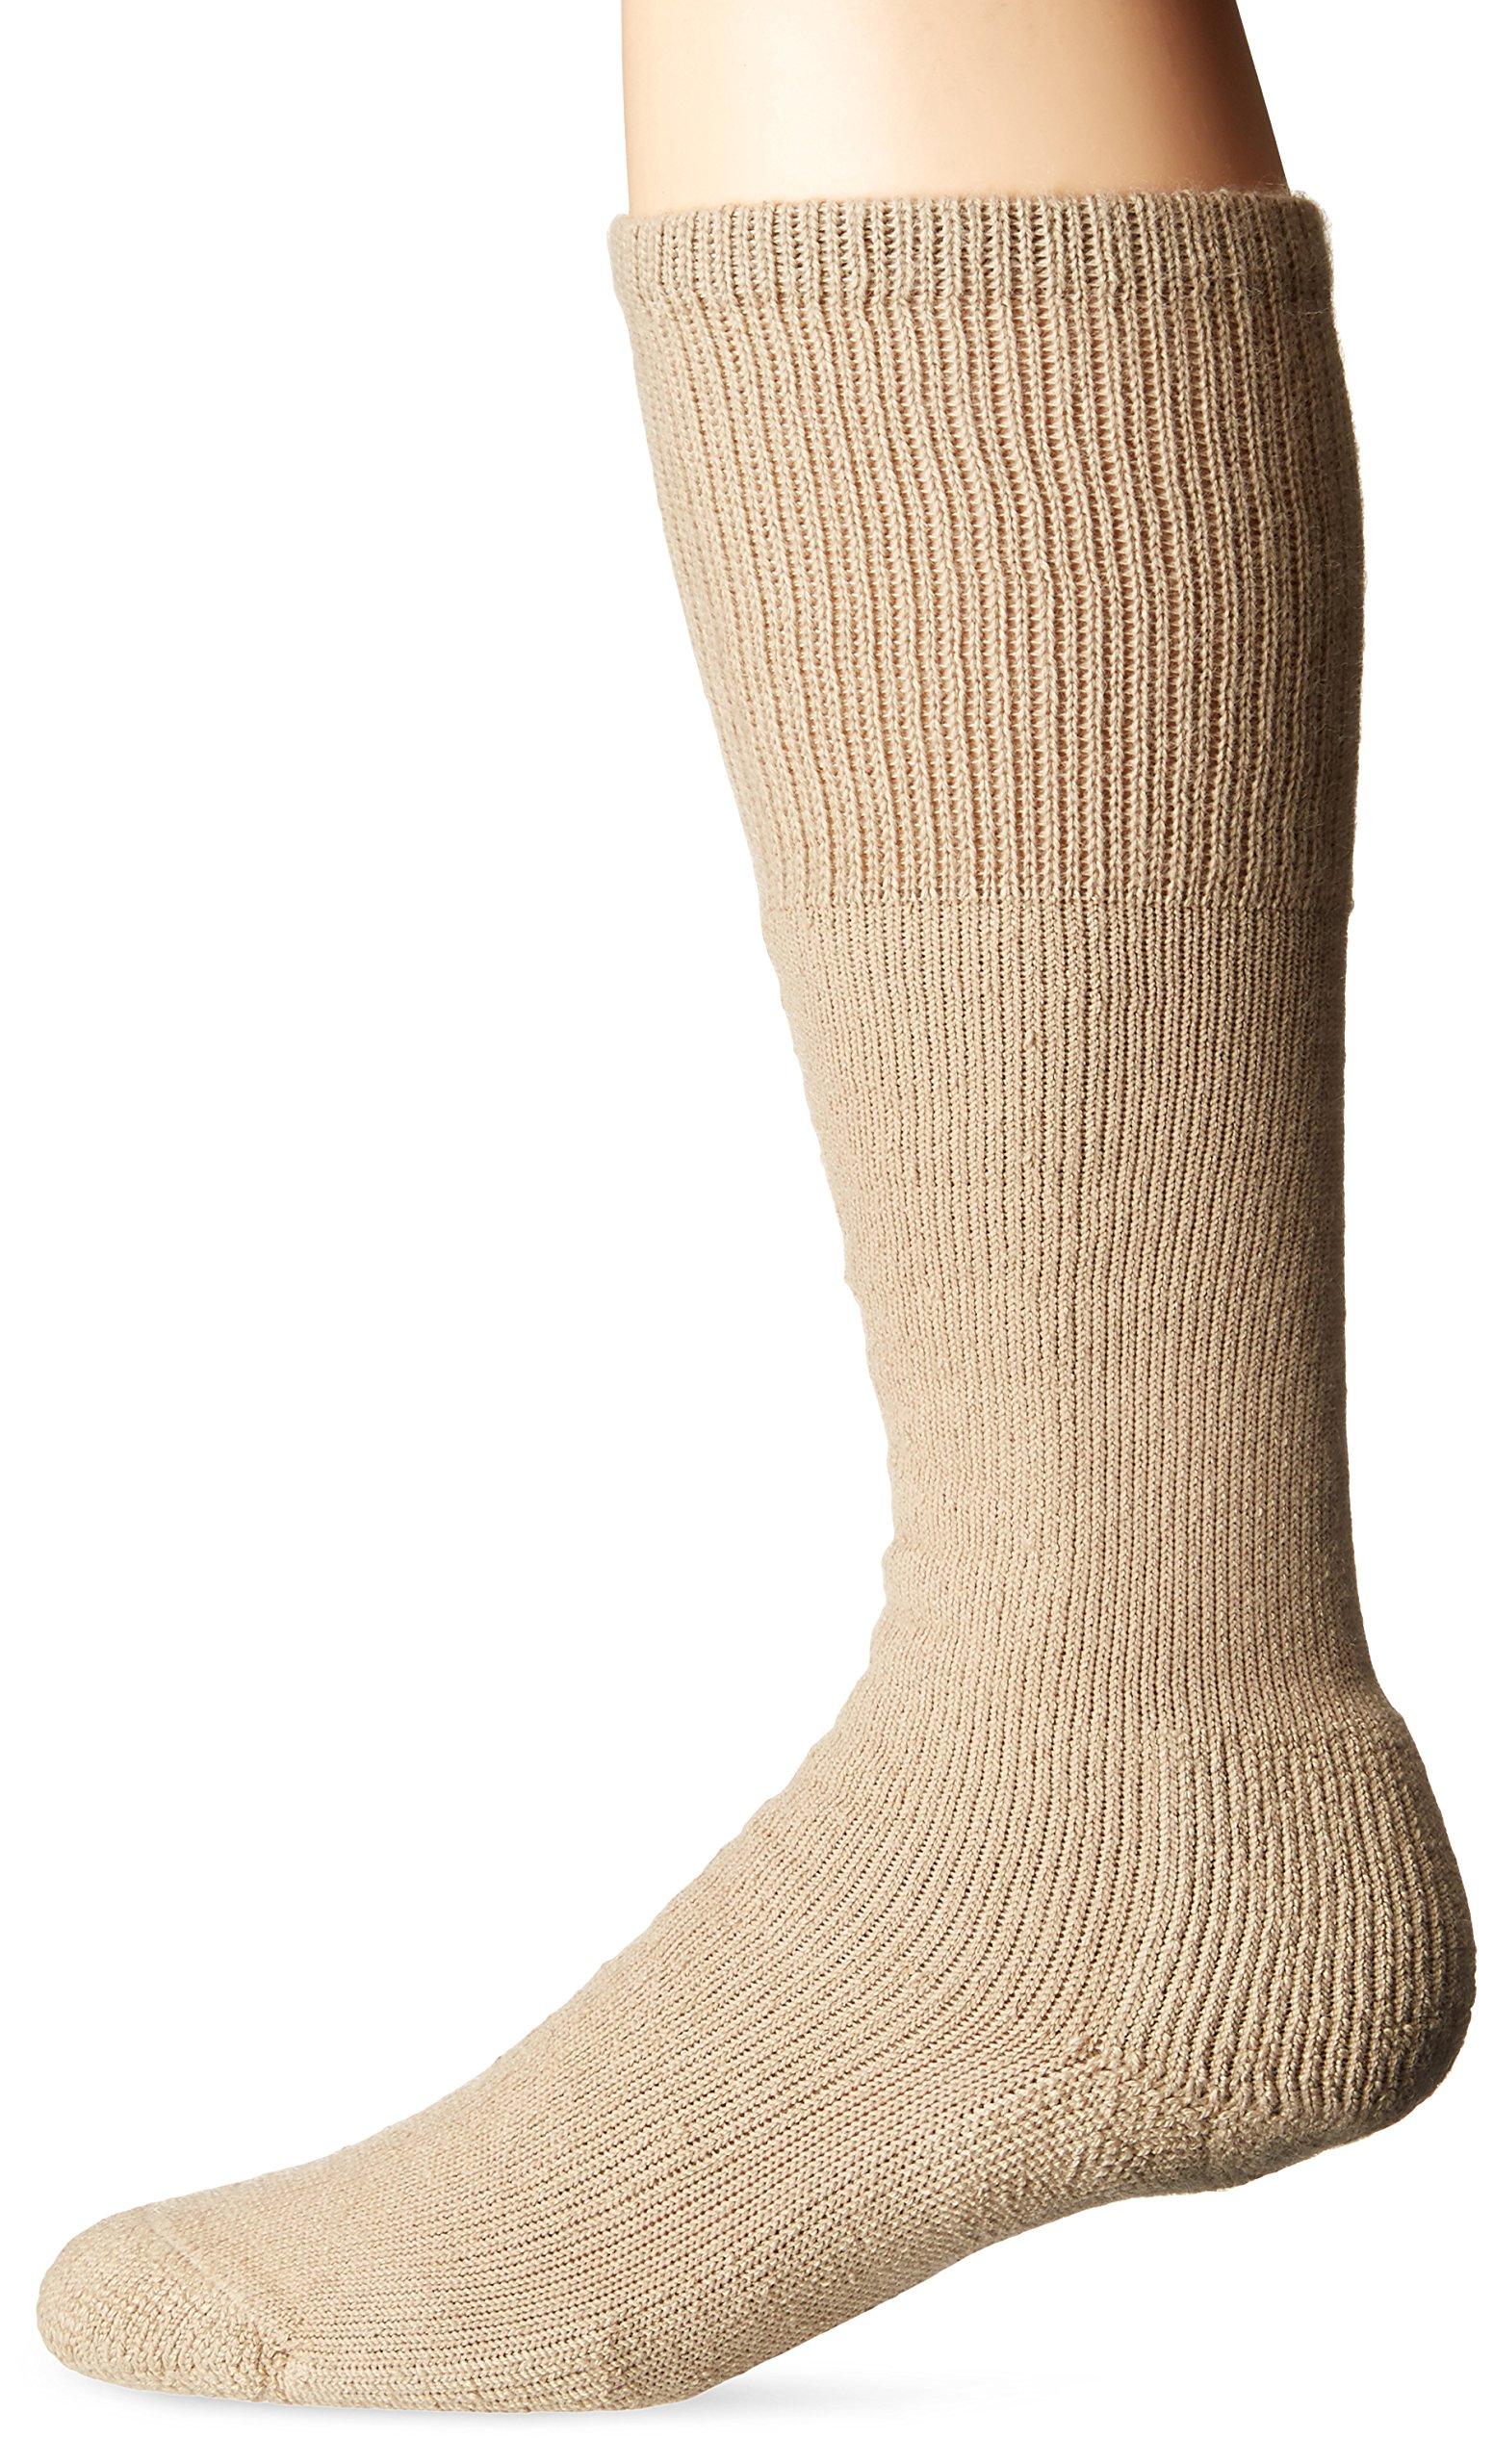 Thorlos Unisex WBO Work Thick Padded Over the Calf Sock, Sand, XLarge